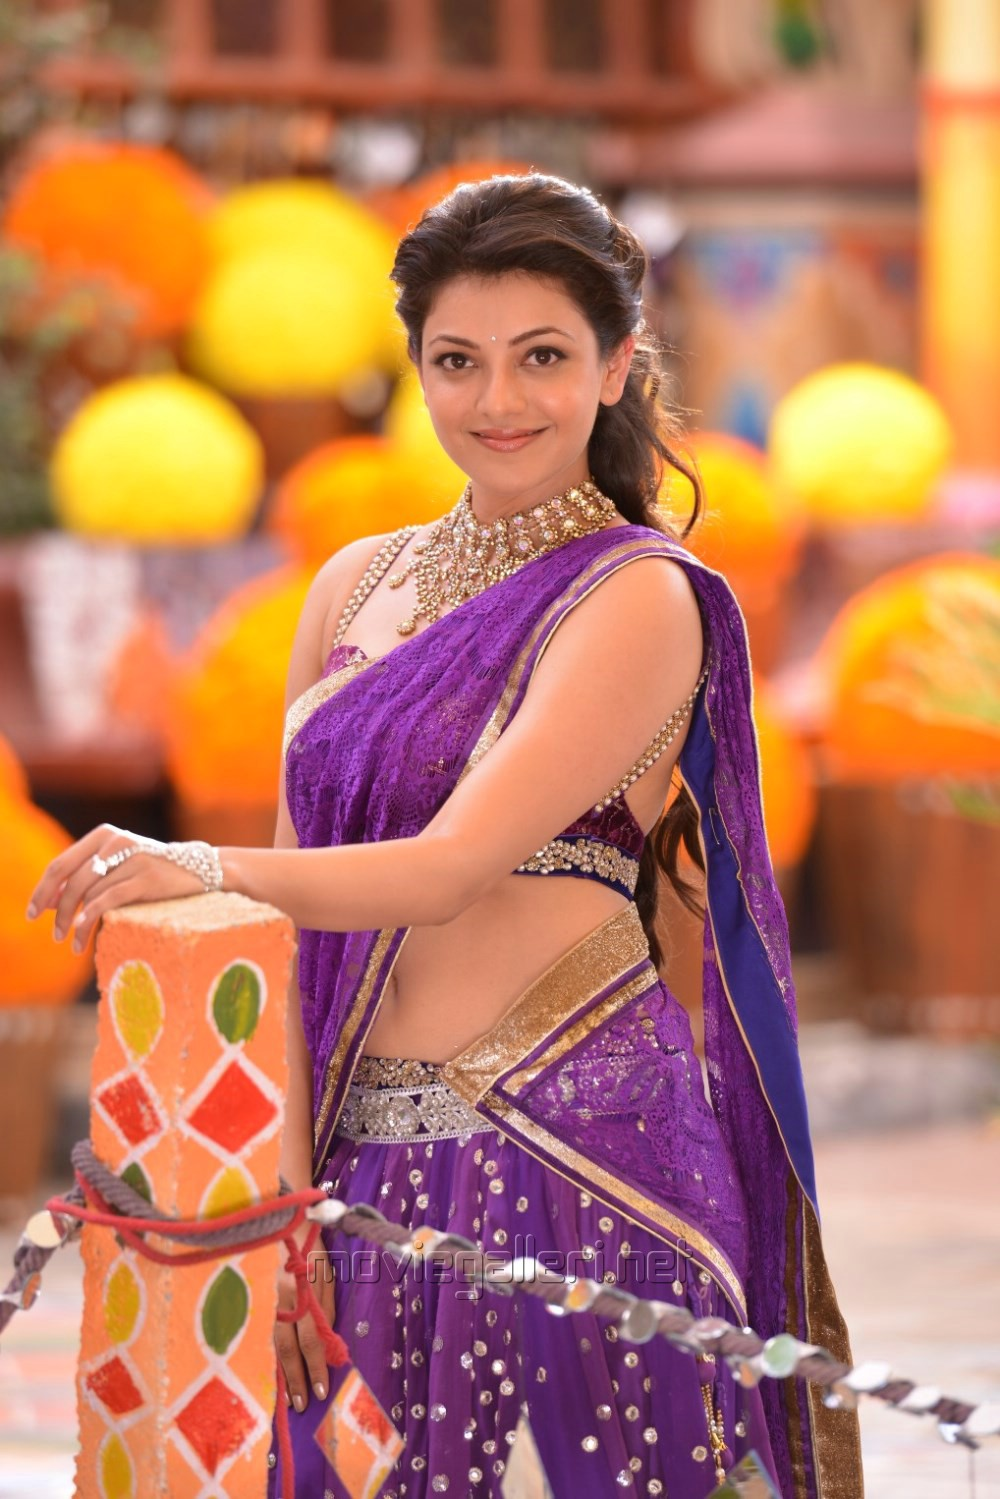 ram leela full movie in tamil mylanchi season 3 episode 67